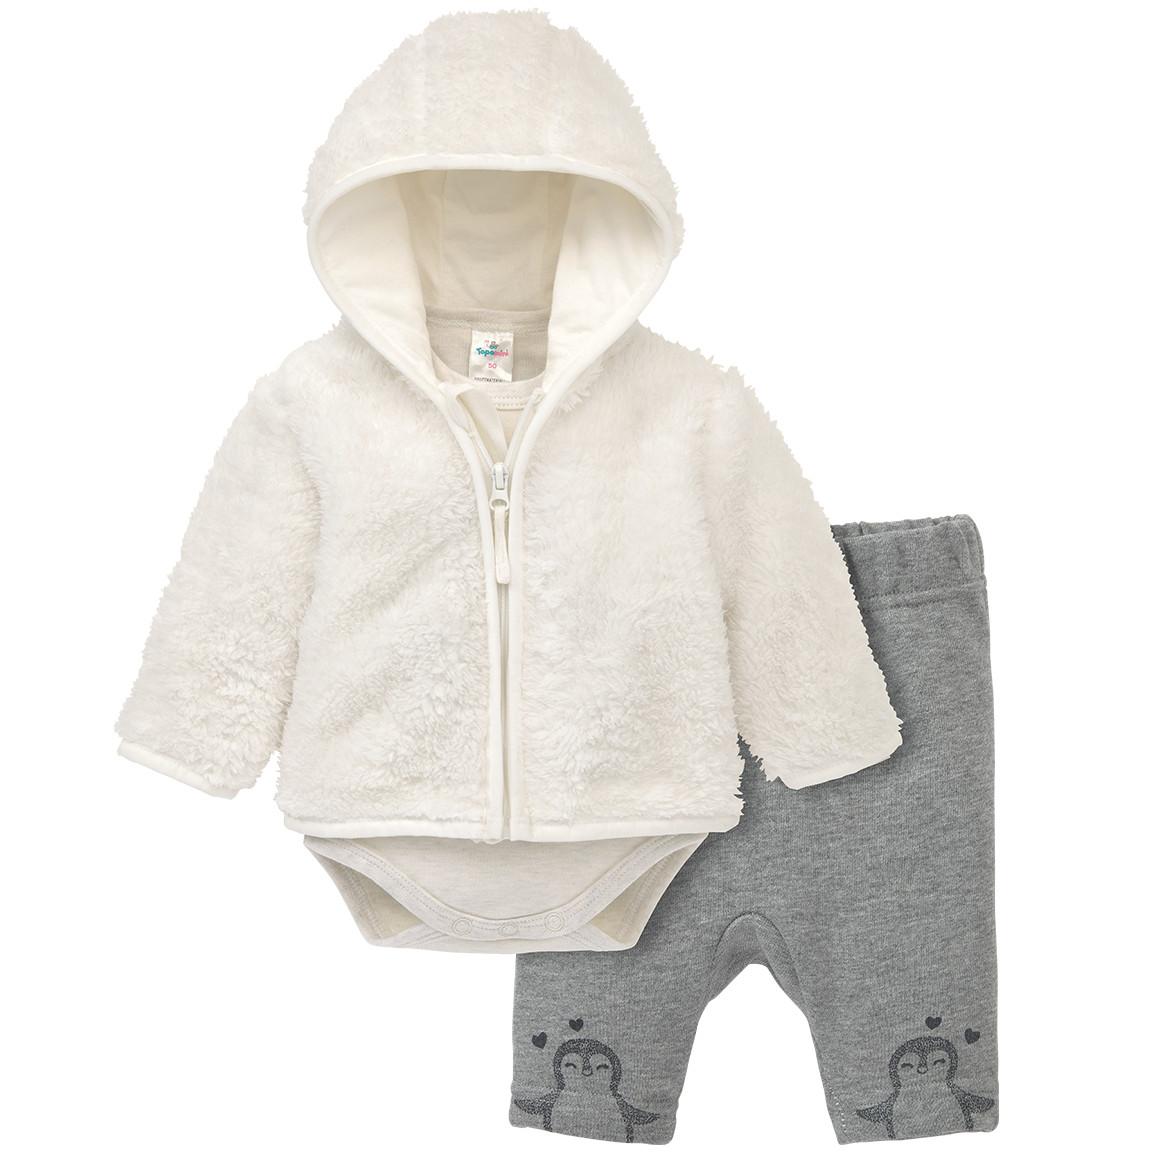 Babysets - Newborn Kuscheljacke, Body und Hose im Set - Onlineshop Ernstings family